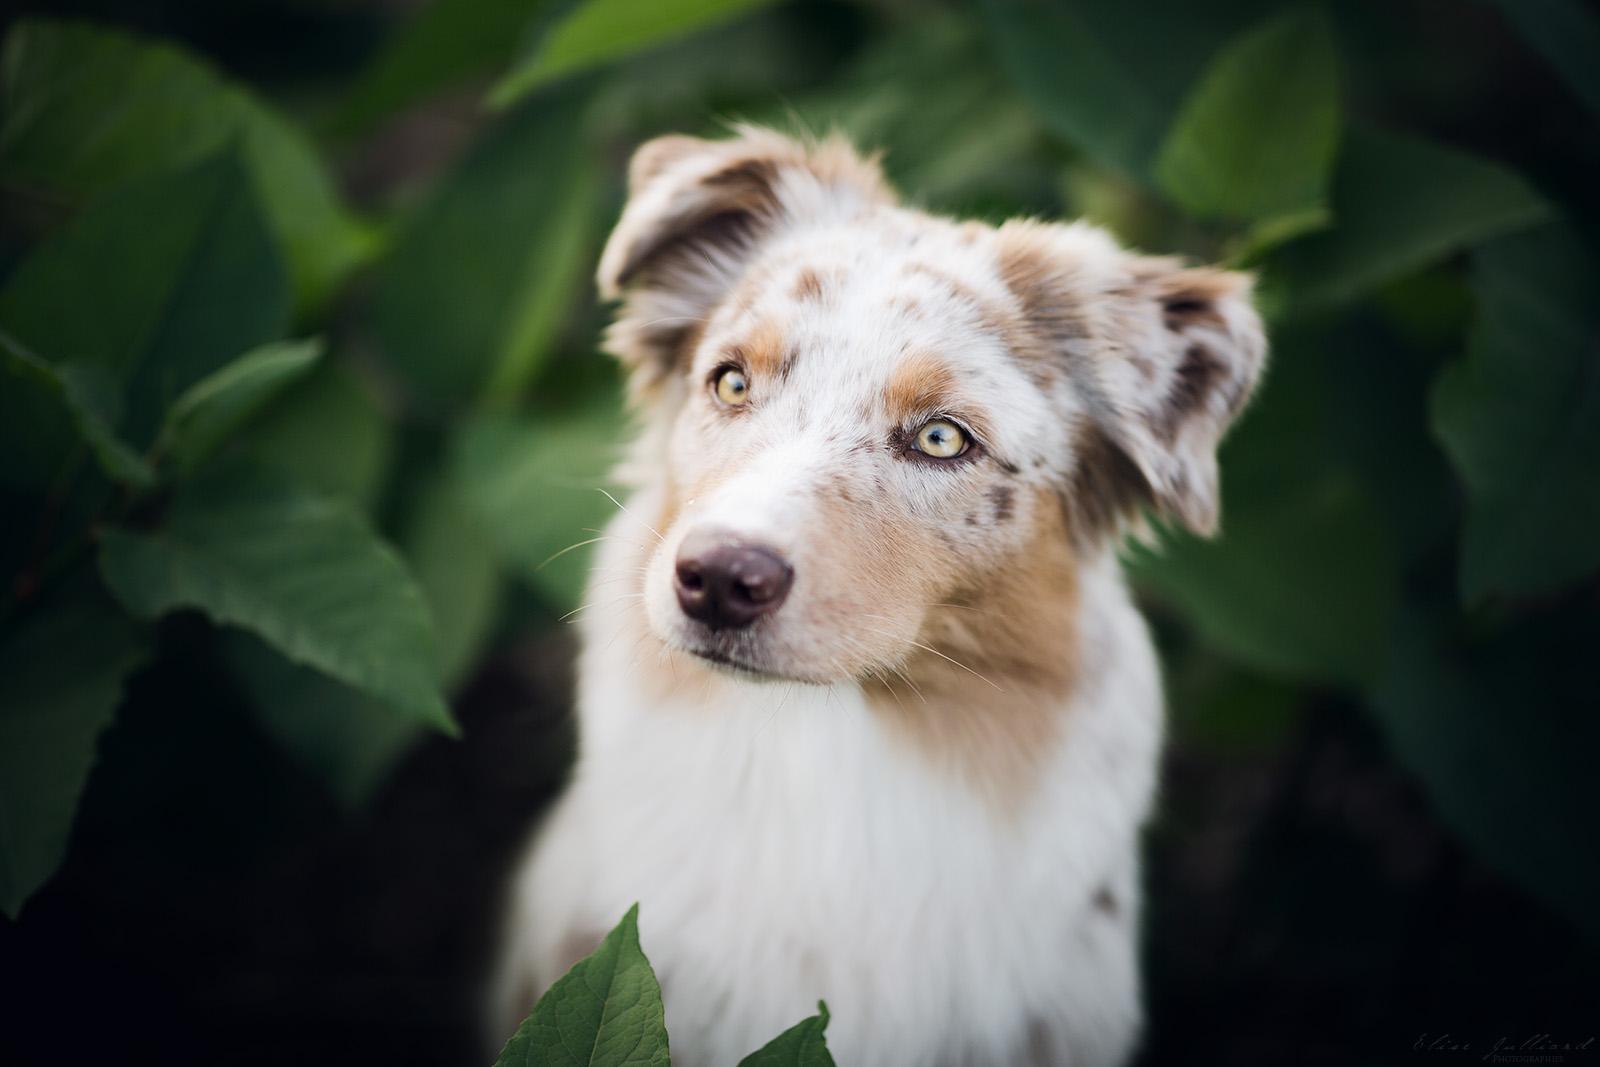 seance-photo-animaux-animal-chien-berger-australien-lyon-auvergne-rhone-alpes-canin-canine-portrait-photographe-animalier-elise-julliard-14